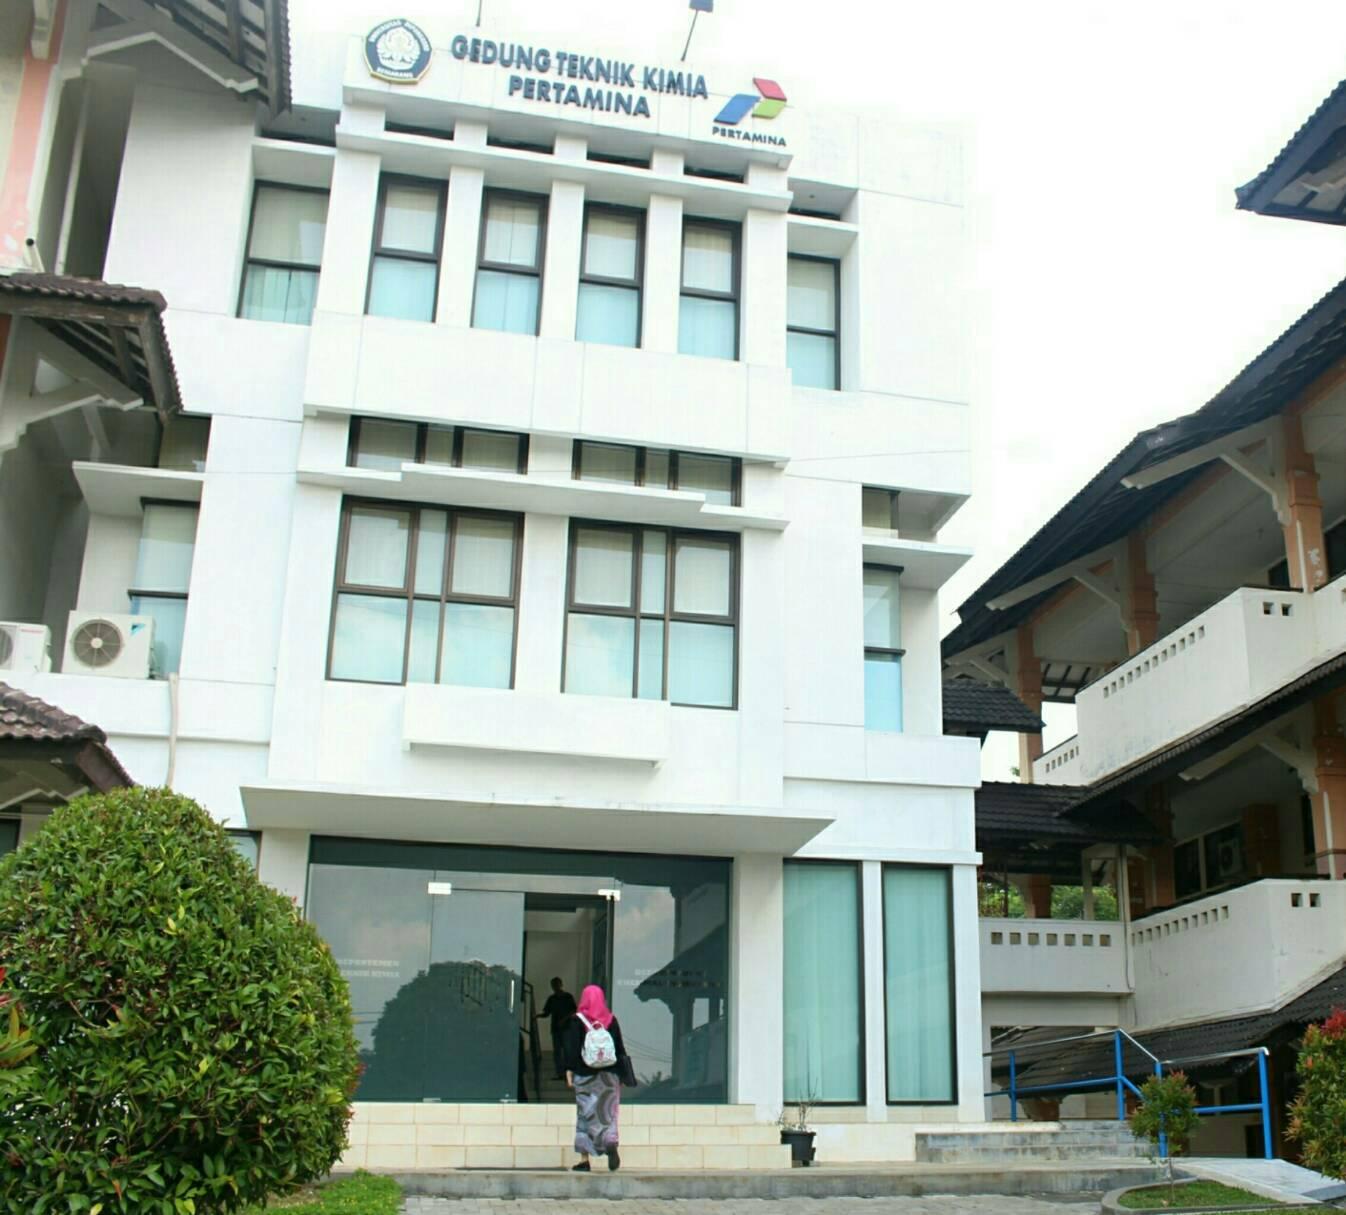 Teknik Kimia merupakan salah satu prodi yang telah mendapatkan pengakuan ASEAN University Network (AUN) sehingga dapat membuka kelas internasional, Rabu (7/6). (Chami/Manunggal)